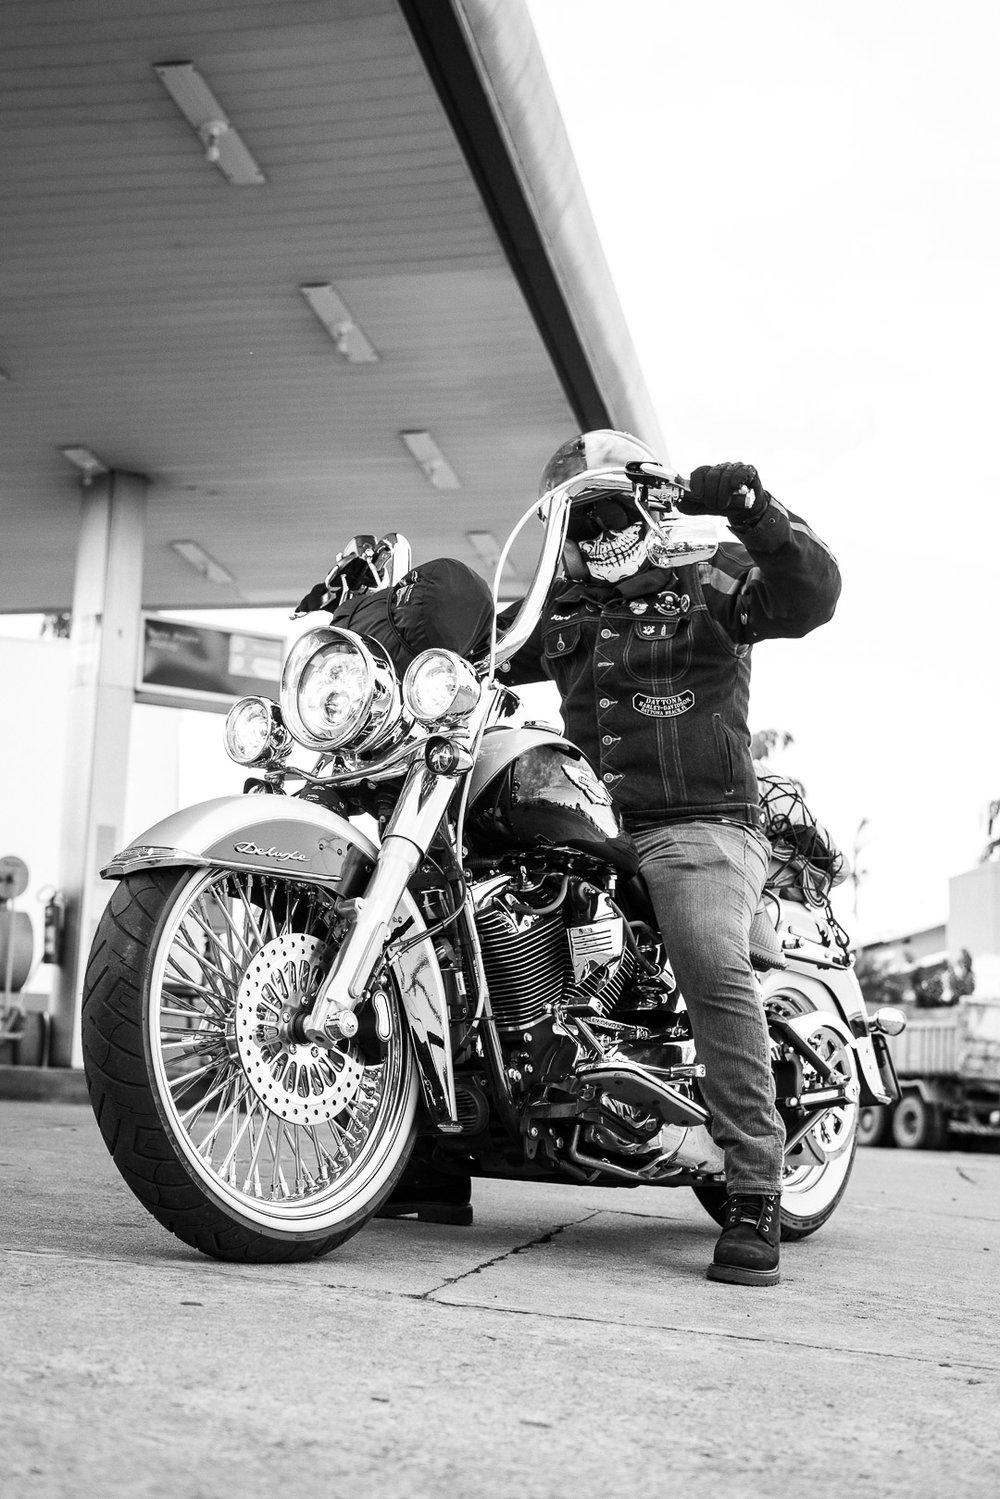 Harley Davidson Style Brasil - Goiania